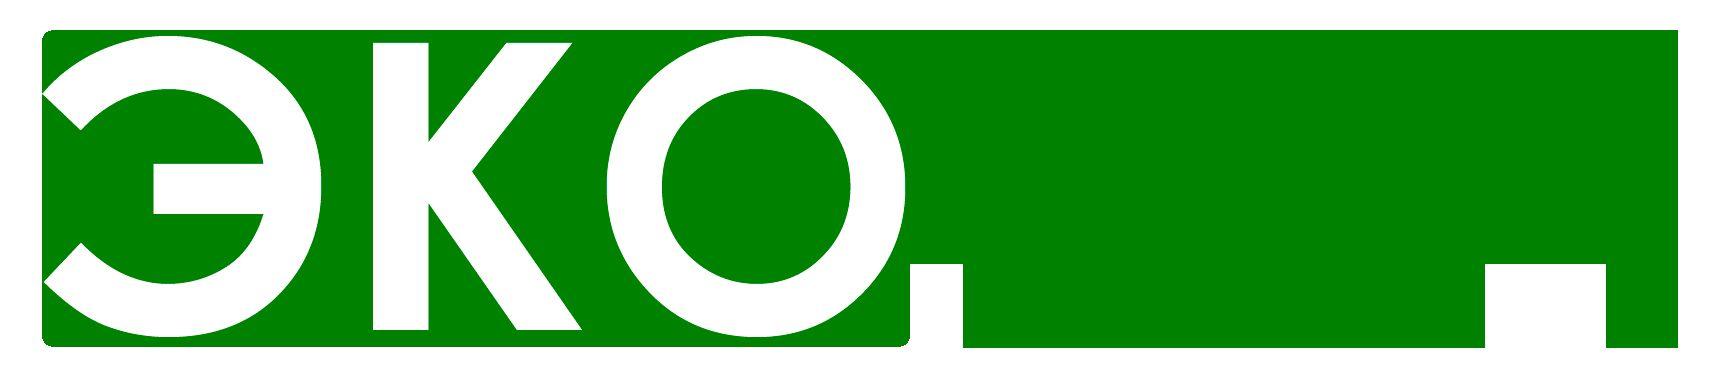 Логотип для научно - технического концерна - дизайнер Kibish